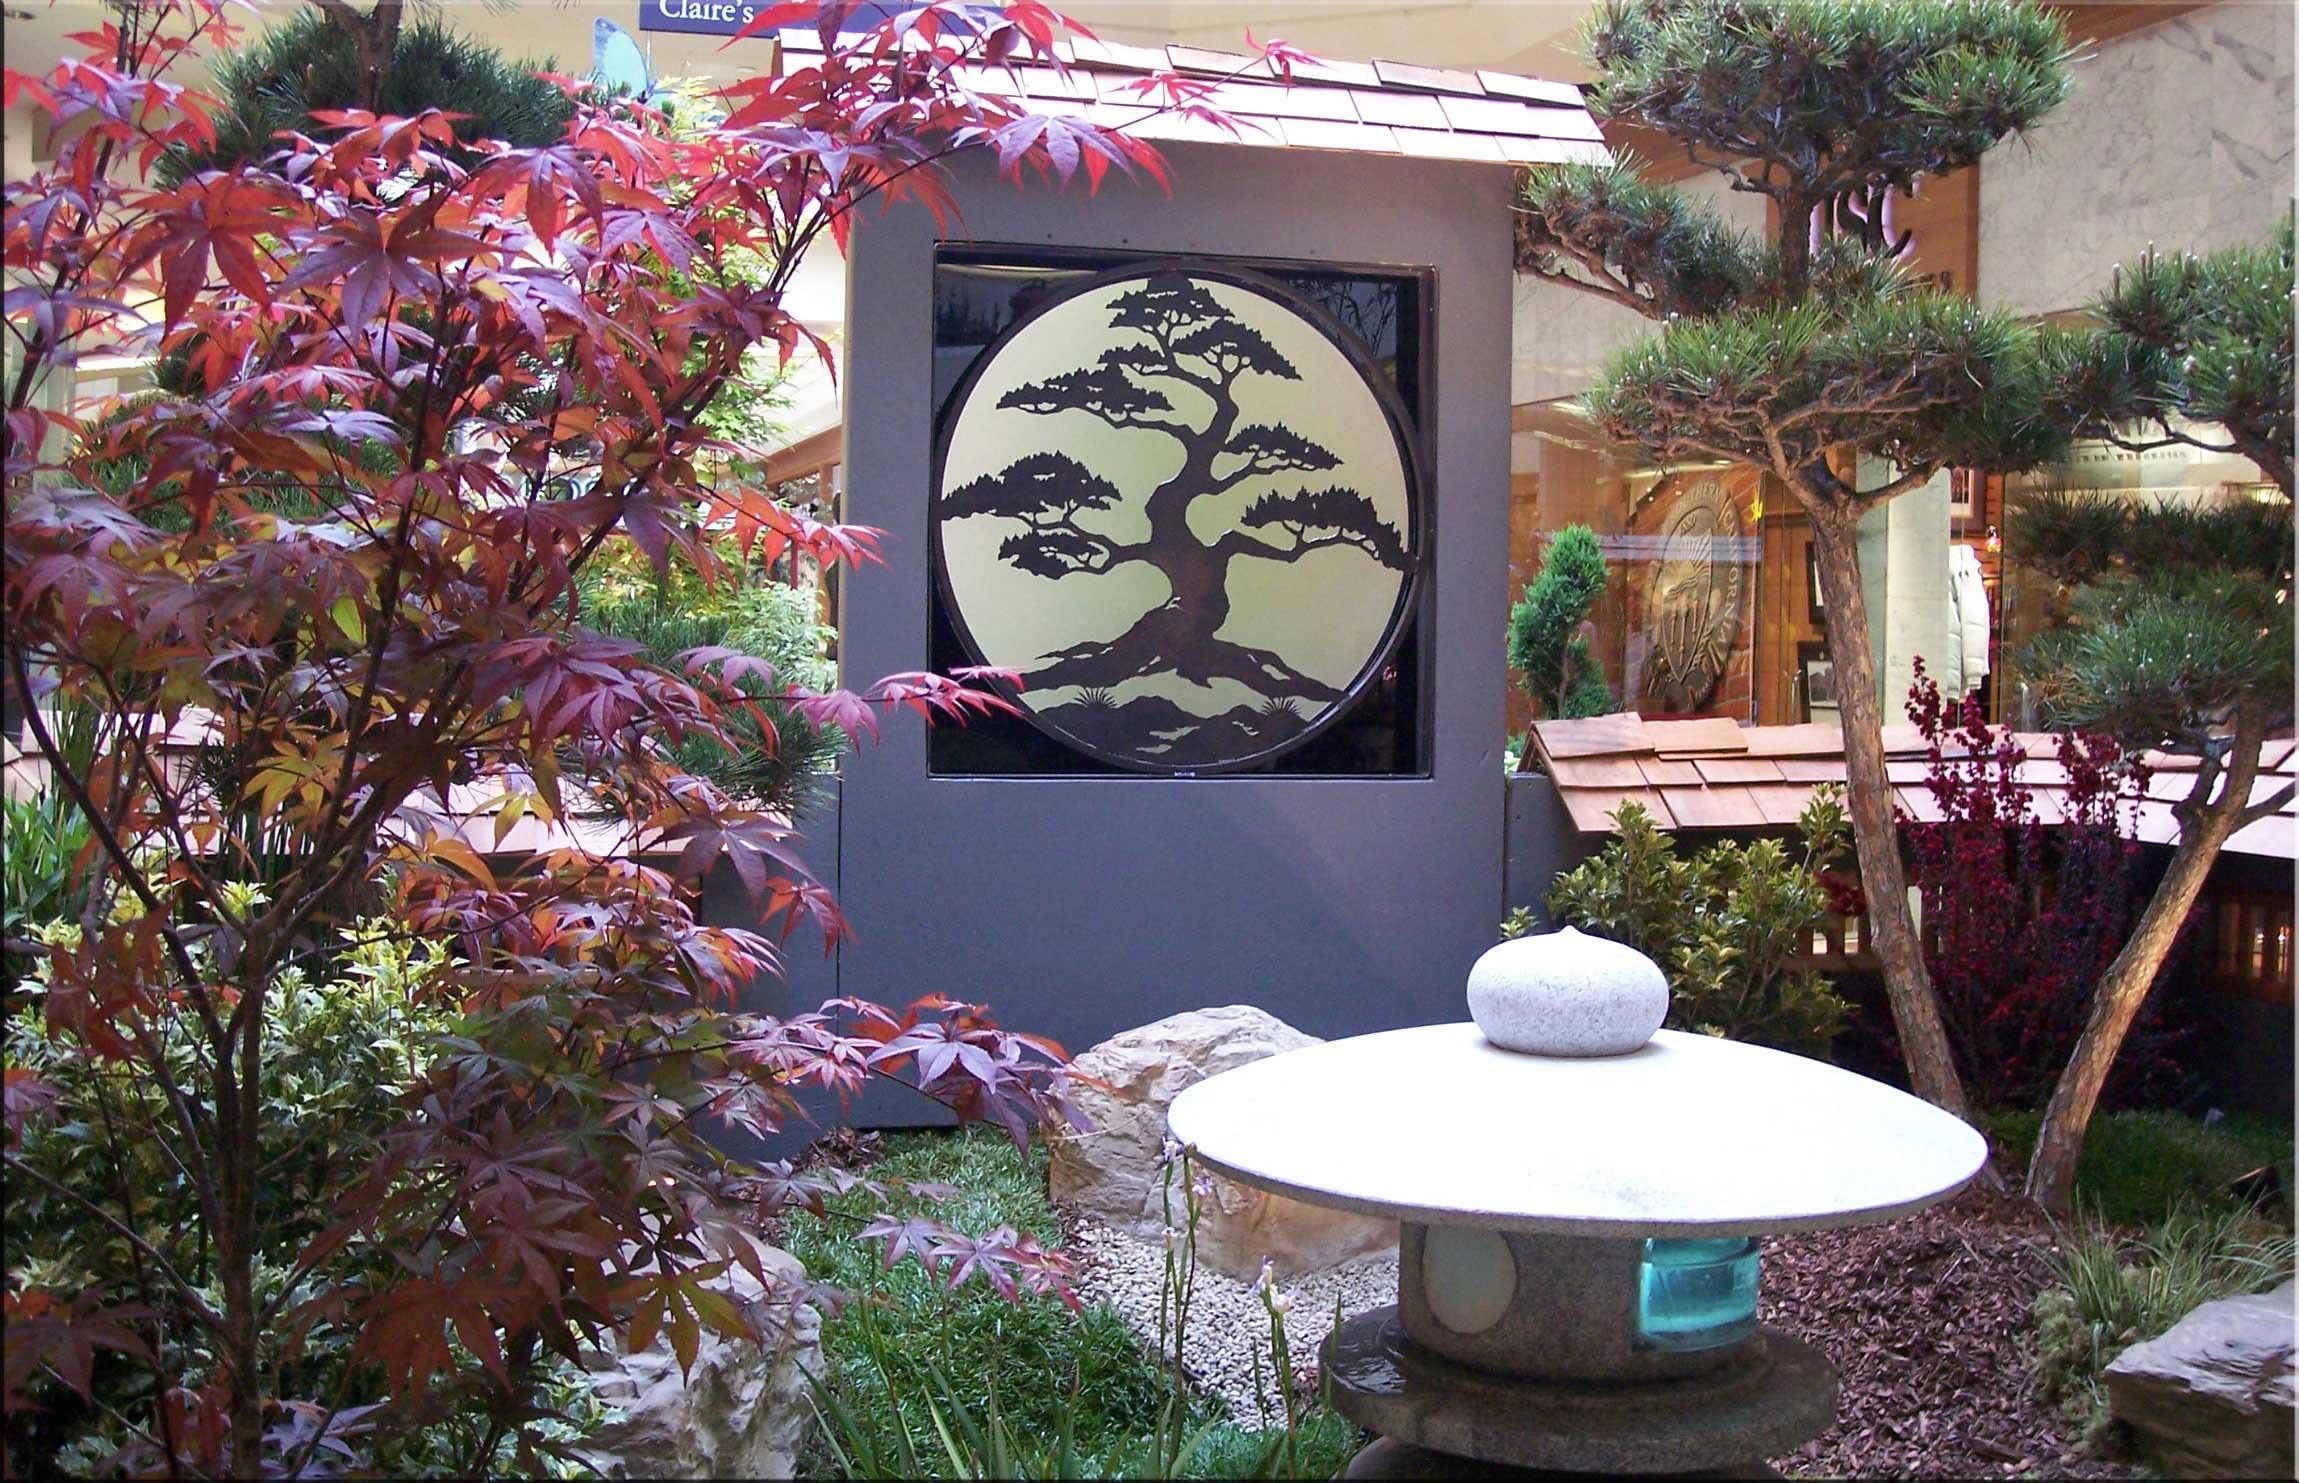 Silhouwest originals metal art by leslie souza tropical art - Japanese garden ideas for landscaping ...